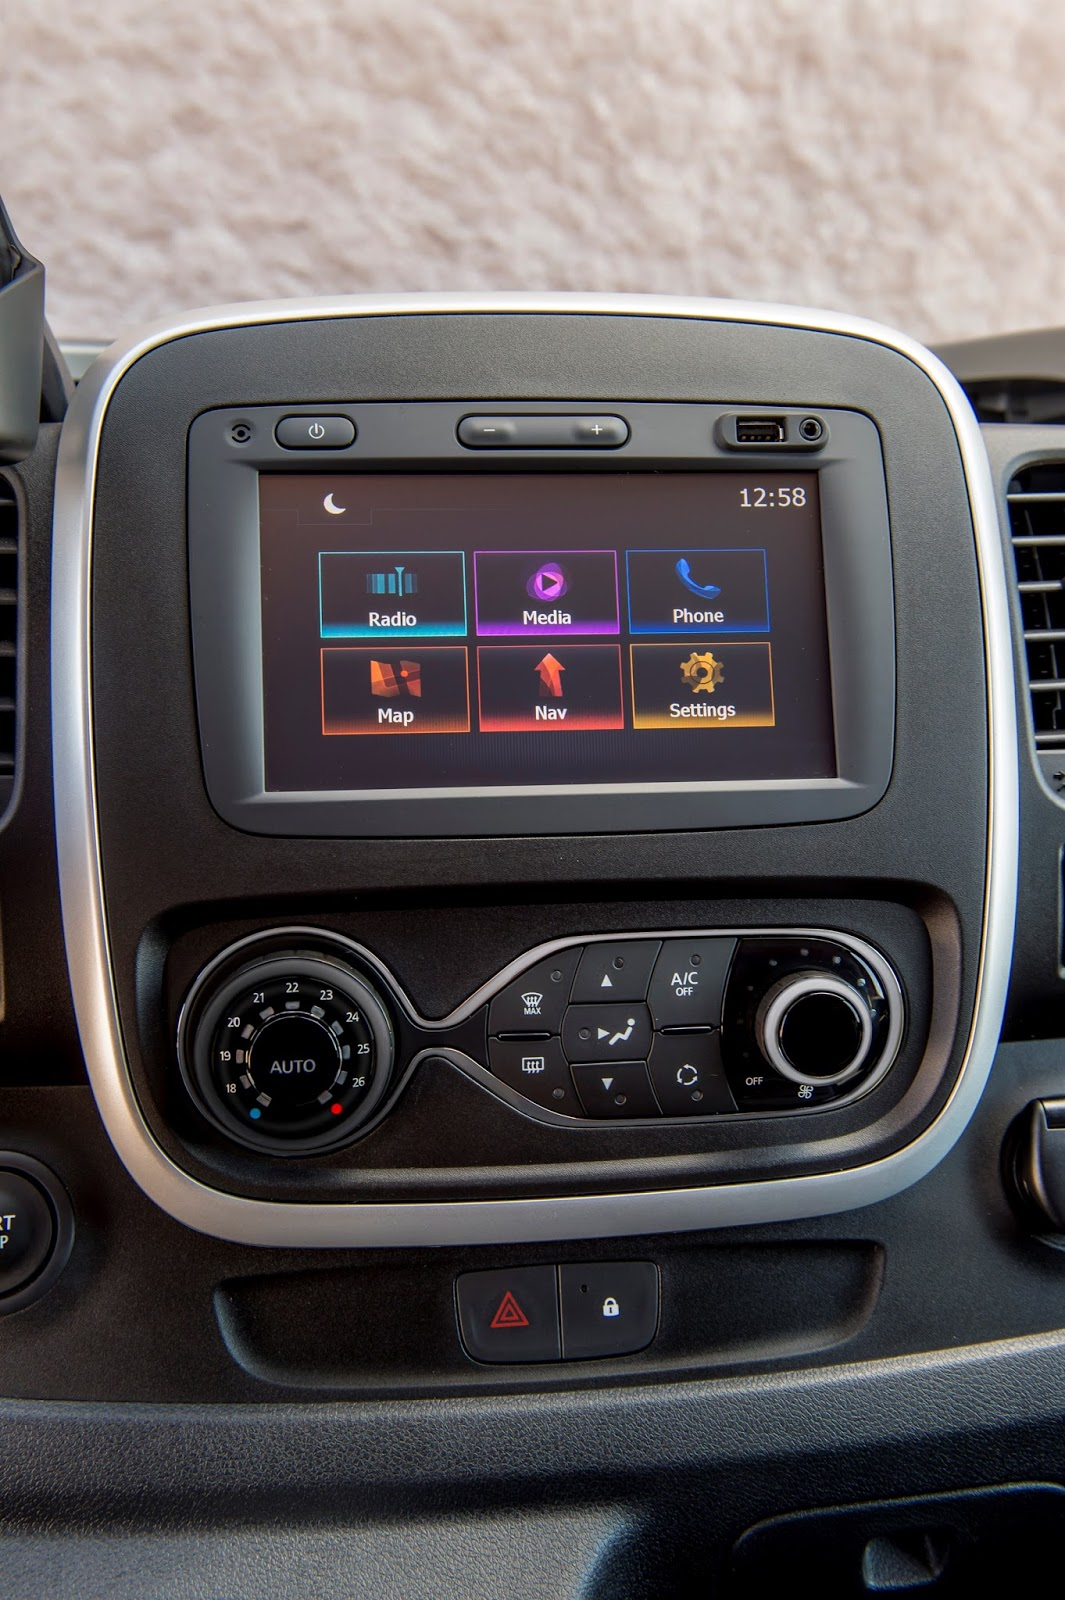 426150099 Nissan NV300 Van Παγκόσμιο ντεμπούτο για το νέο Nissan NV300 Nissan, Nissan NV, Nissan NV300, Nissan NV400, VAN, videos, Επαγγελματικά